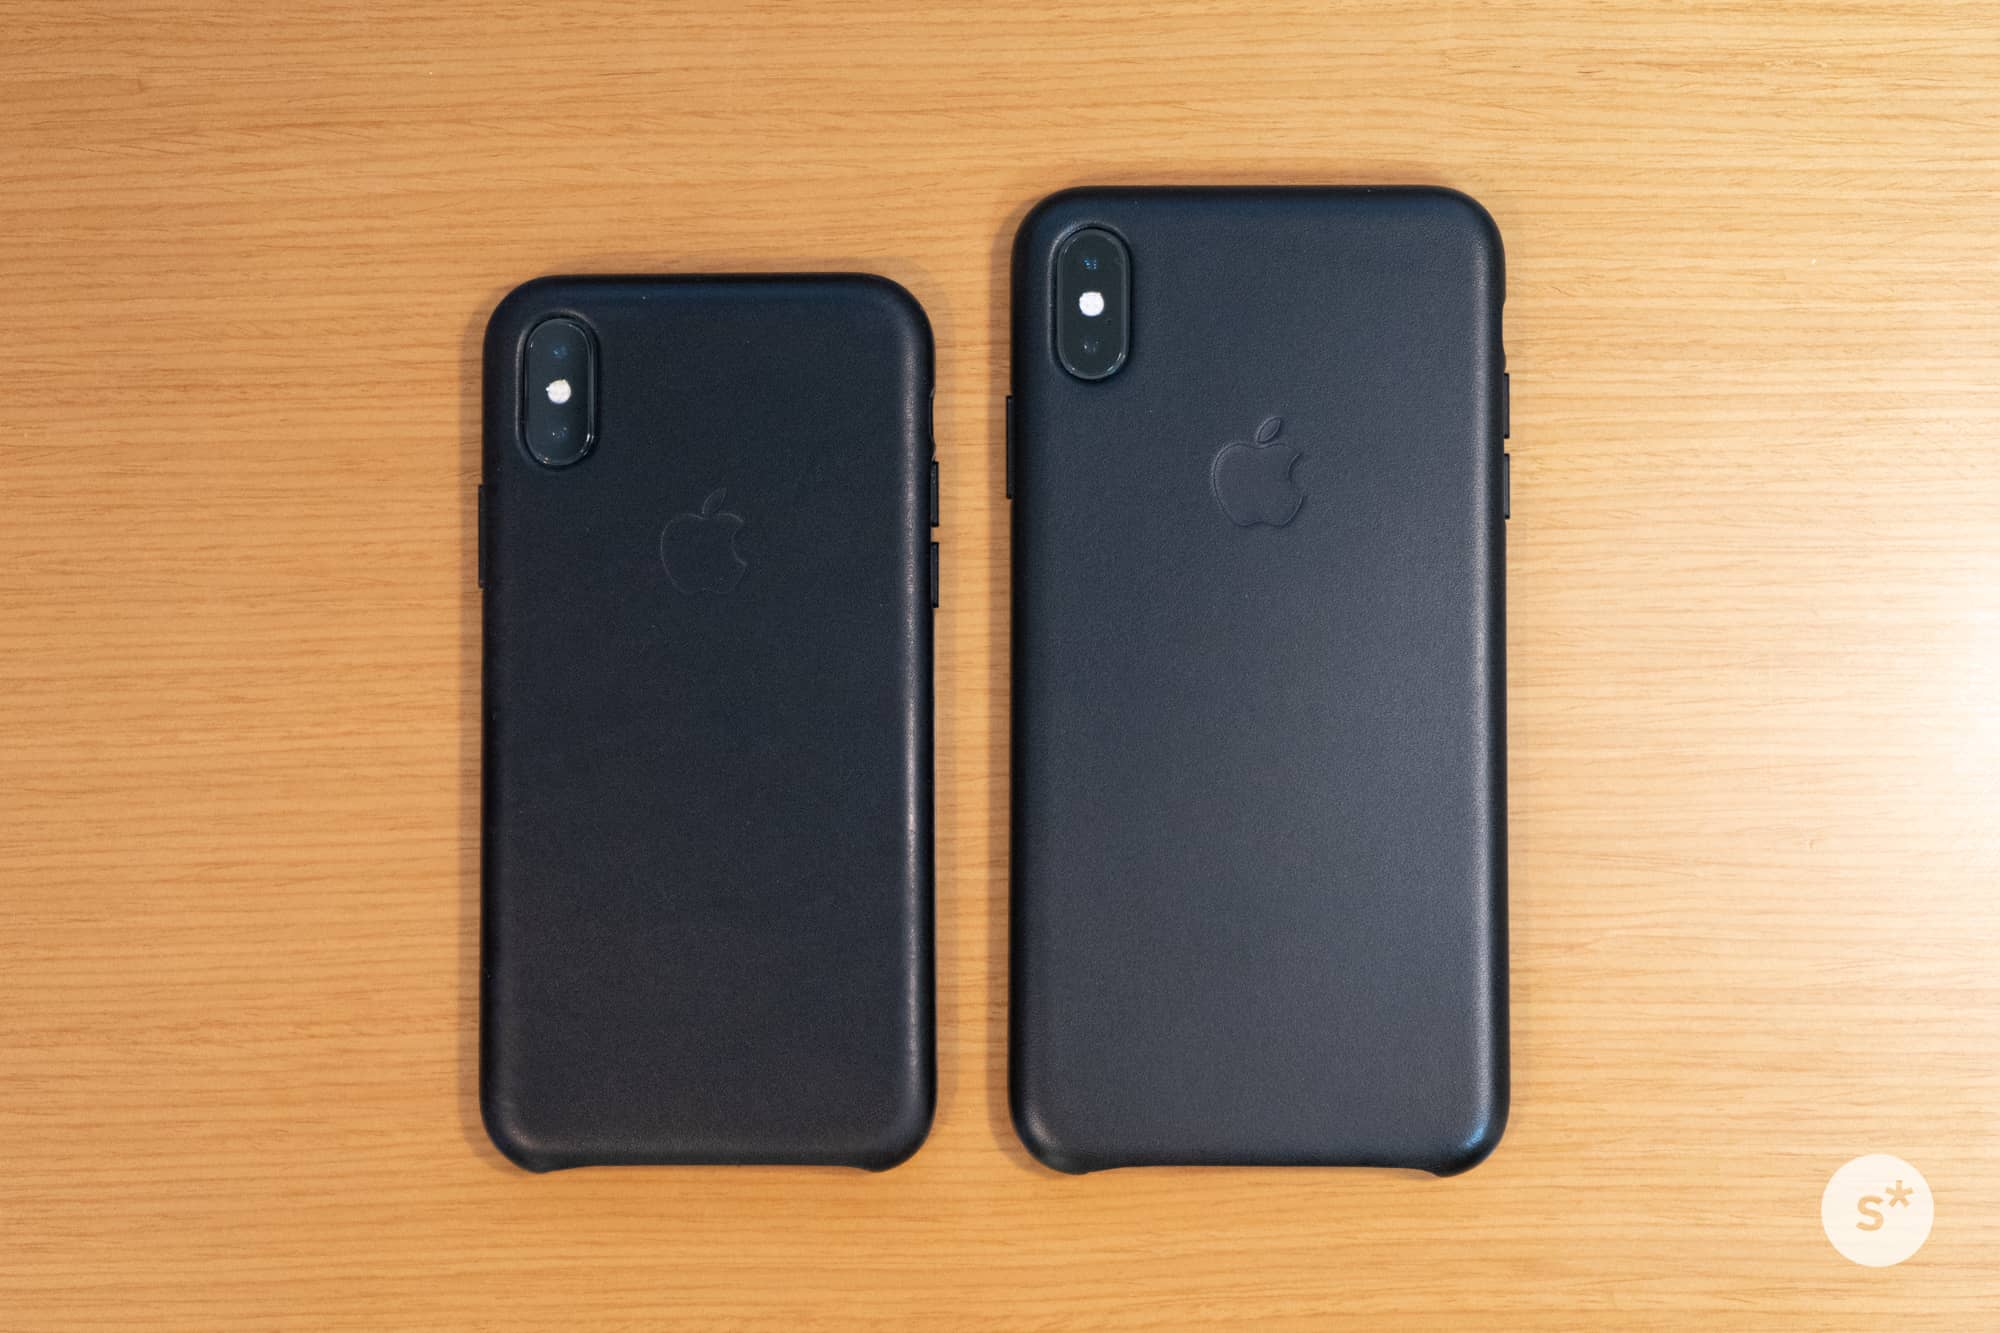 左:iPhone X|右:iPhone XS Max